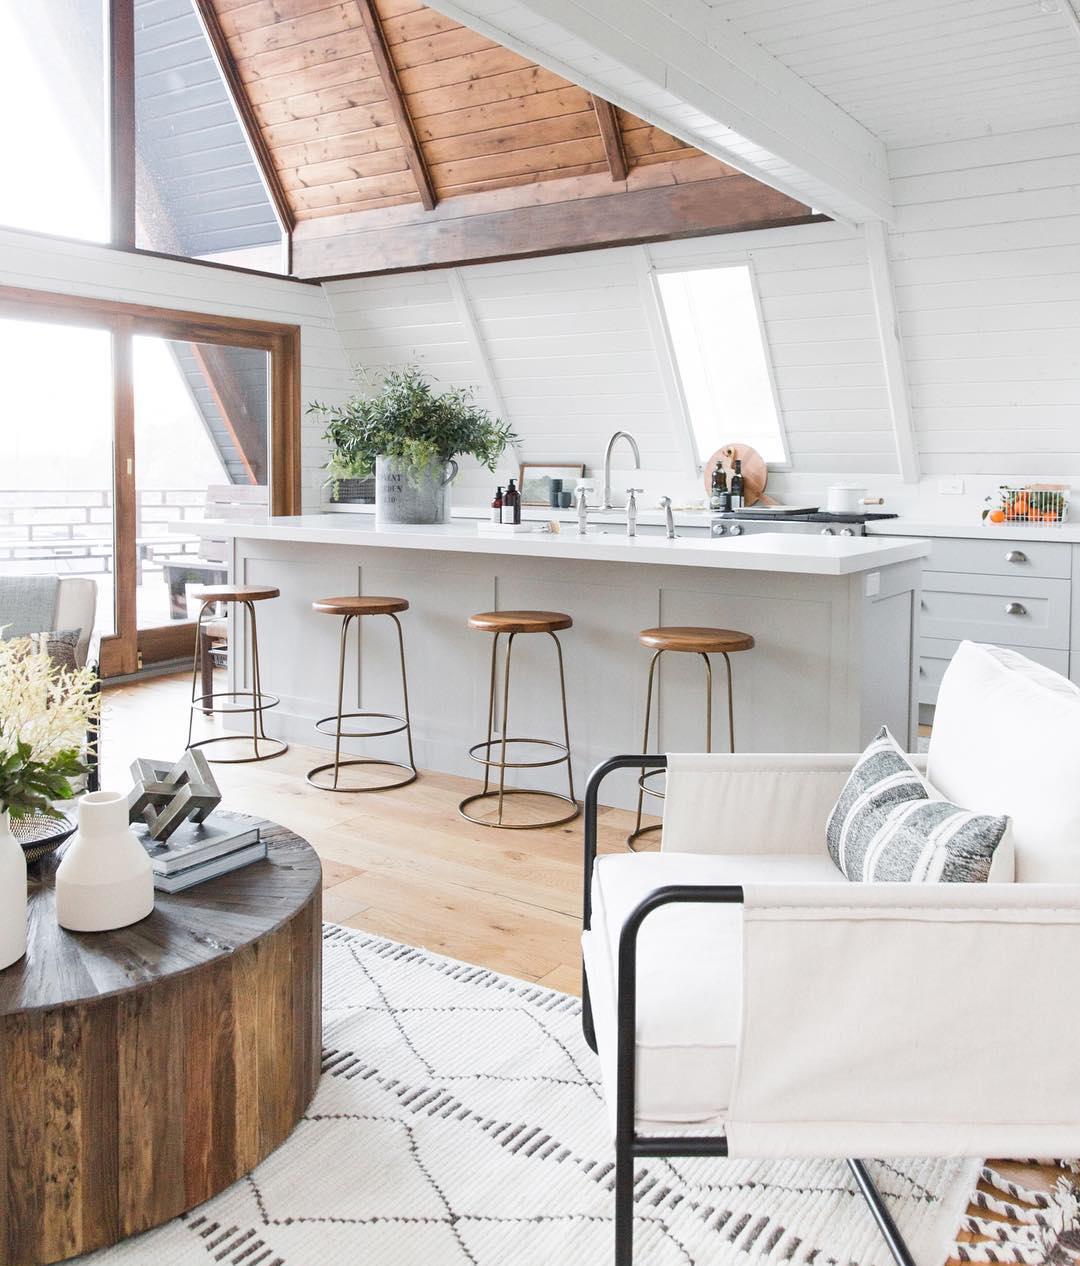 Studio MgGee Kitchen Design